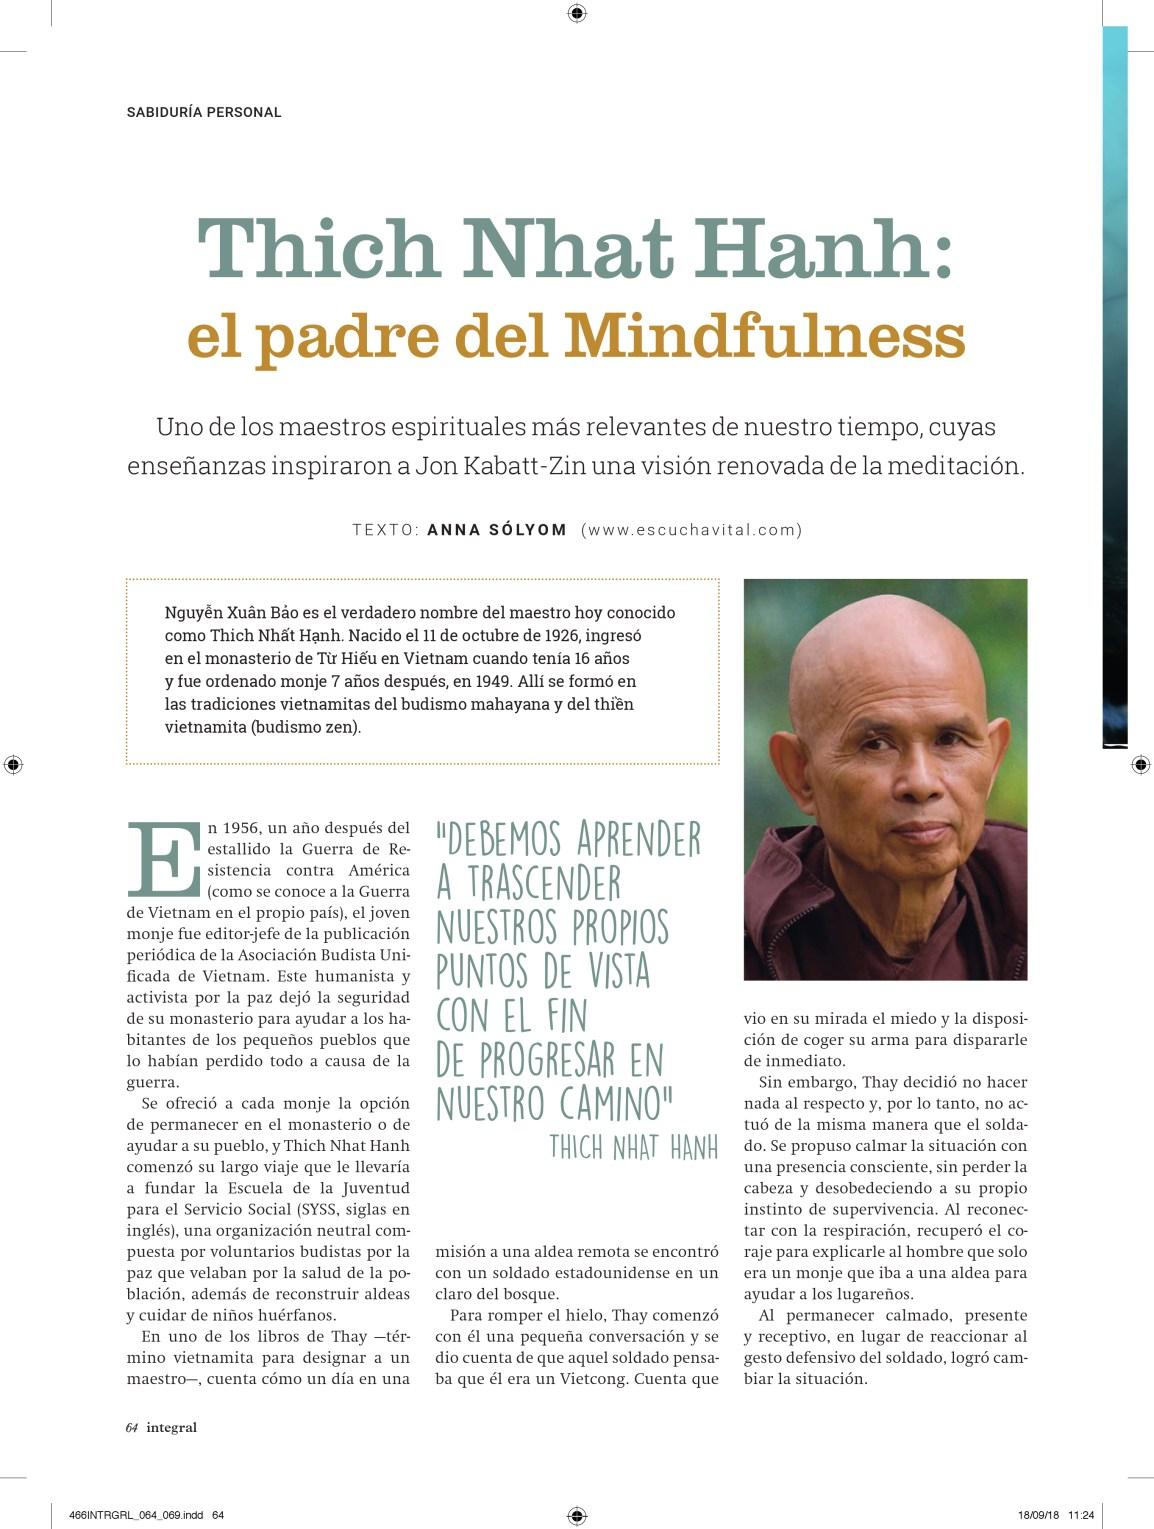 466INTRGRL_064_069-Thich Nhat Hanh_000001